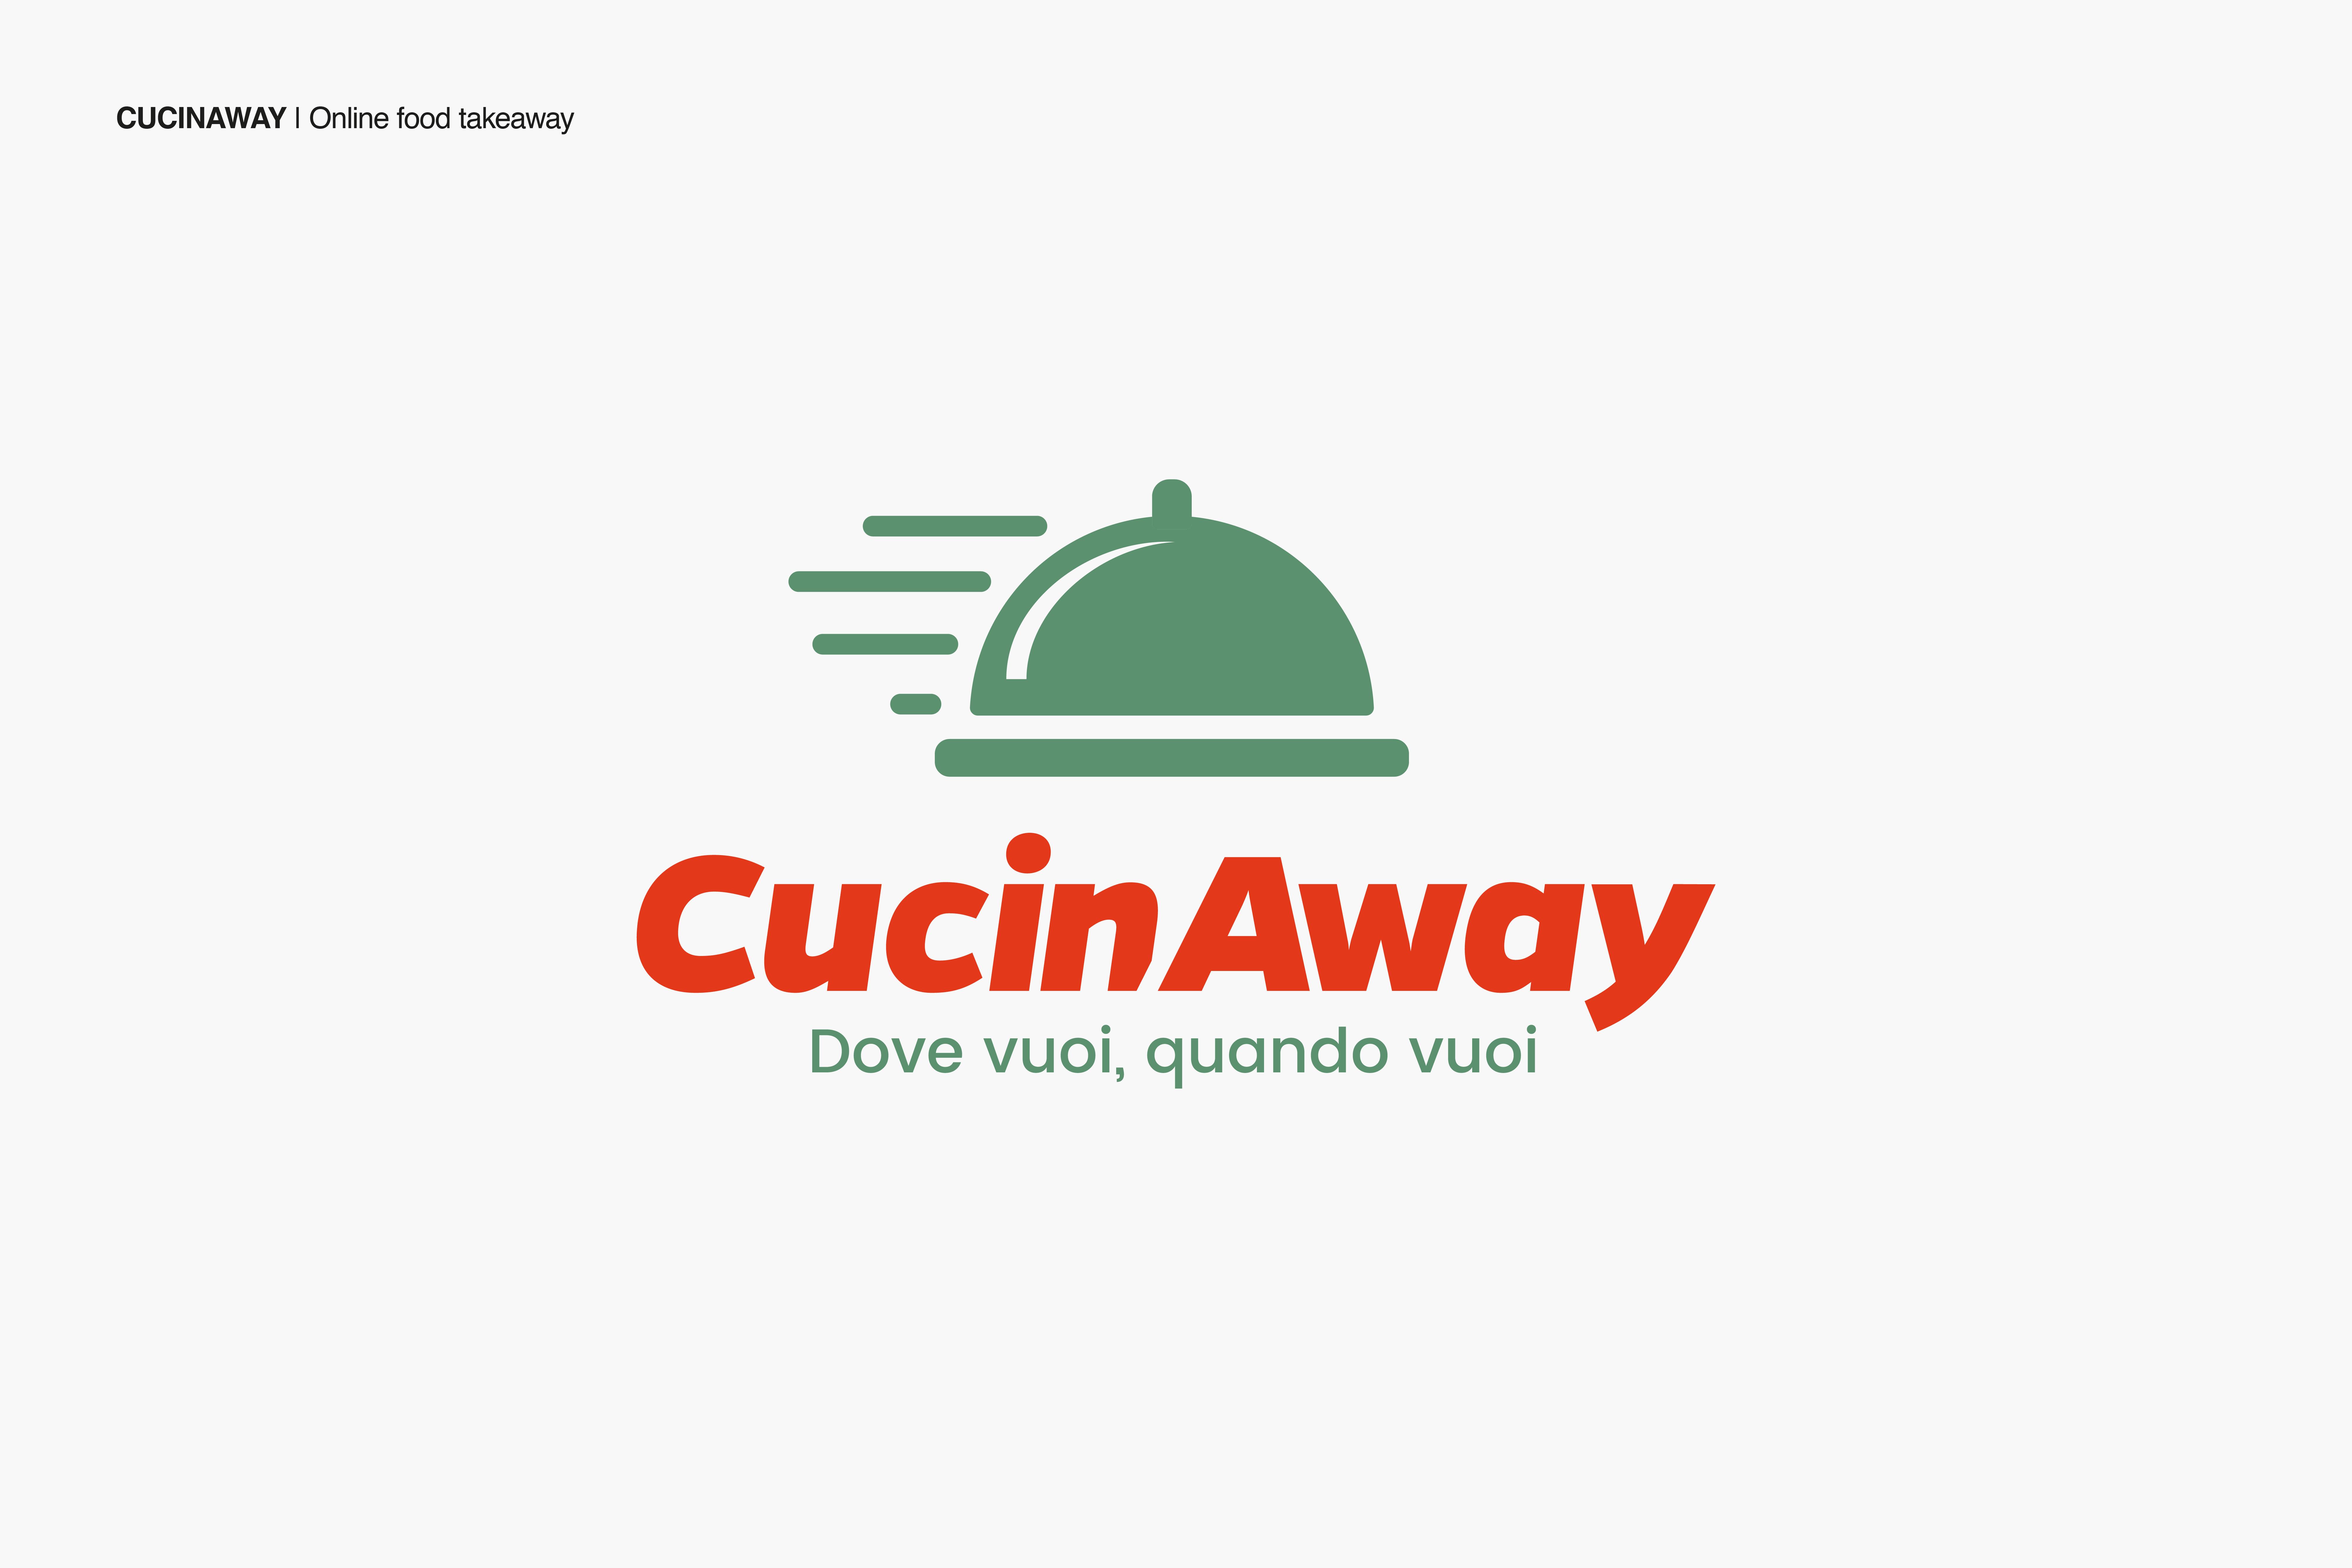 Logo Cucinaway by Zerouno Design